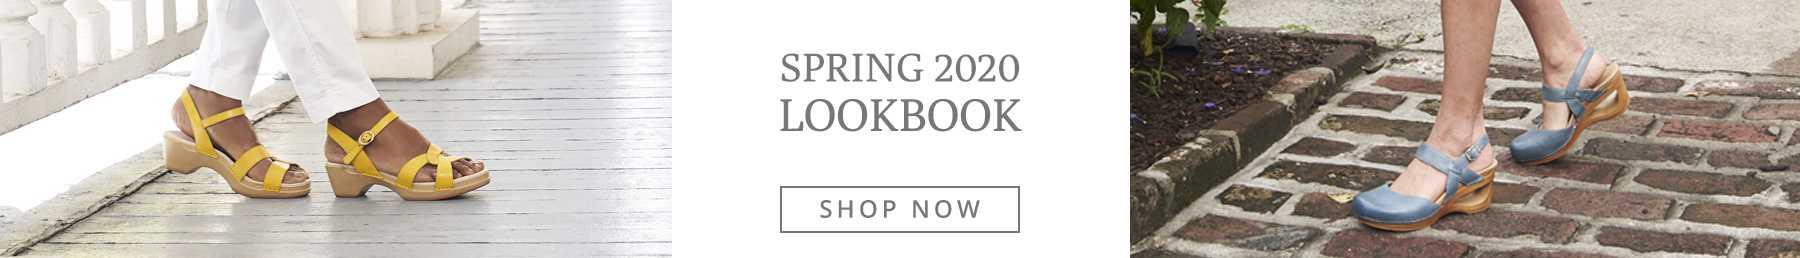 Dansko Spring 2020 Lookbook